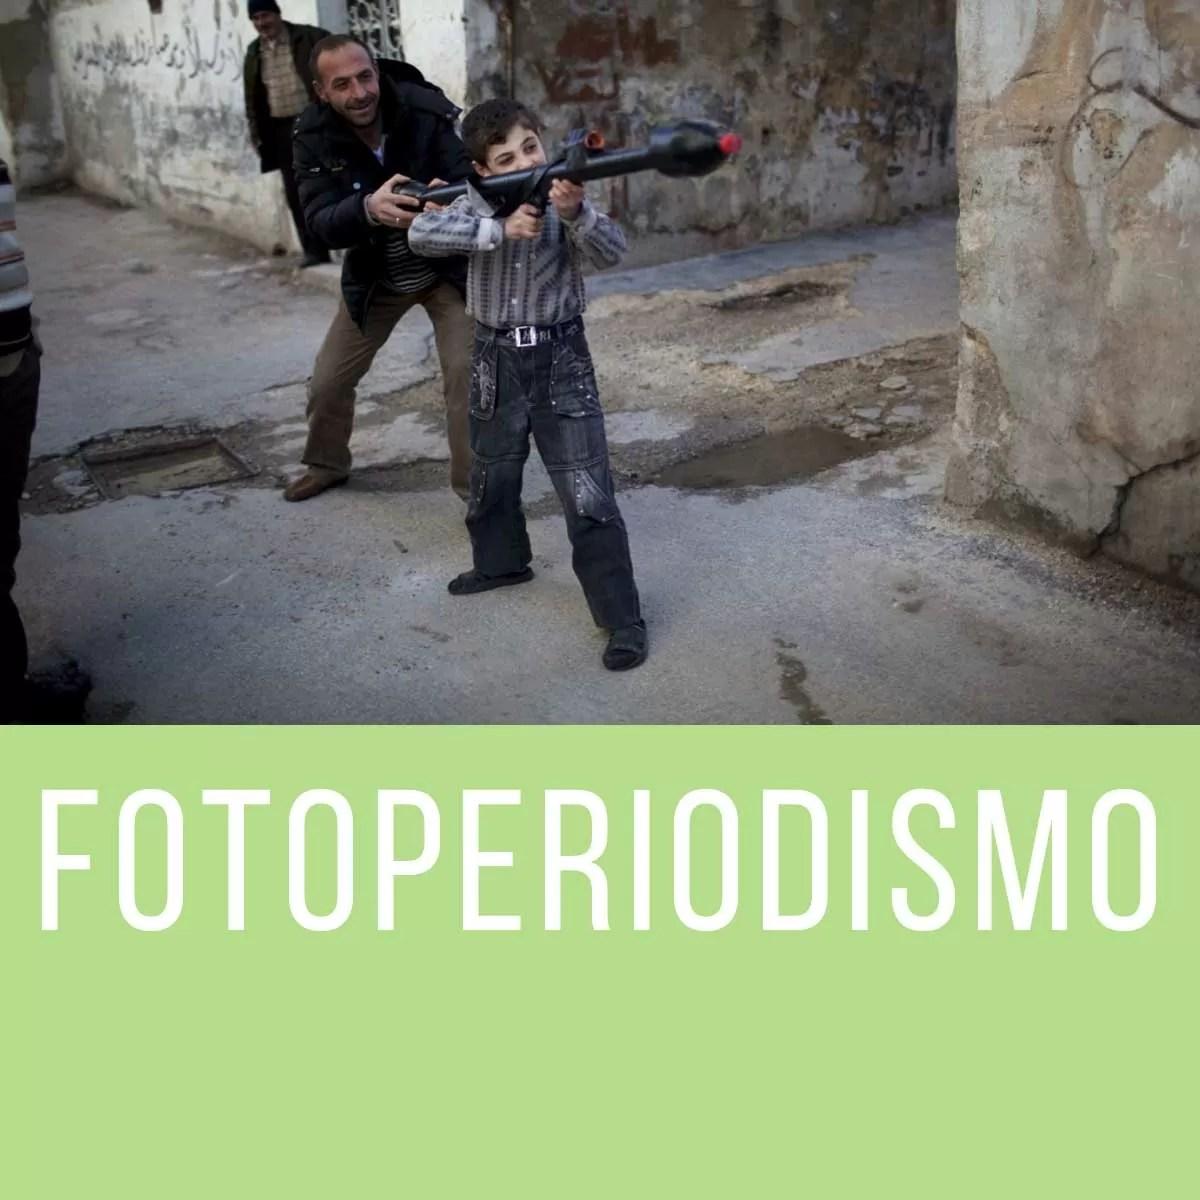 El Fotoperiodismo